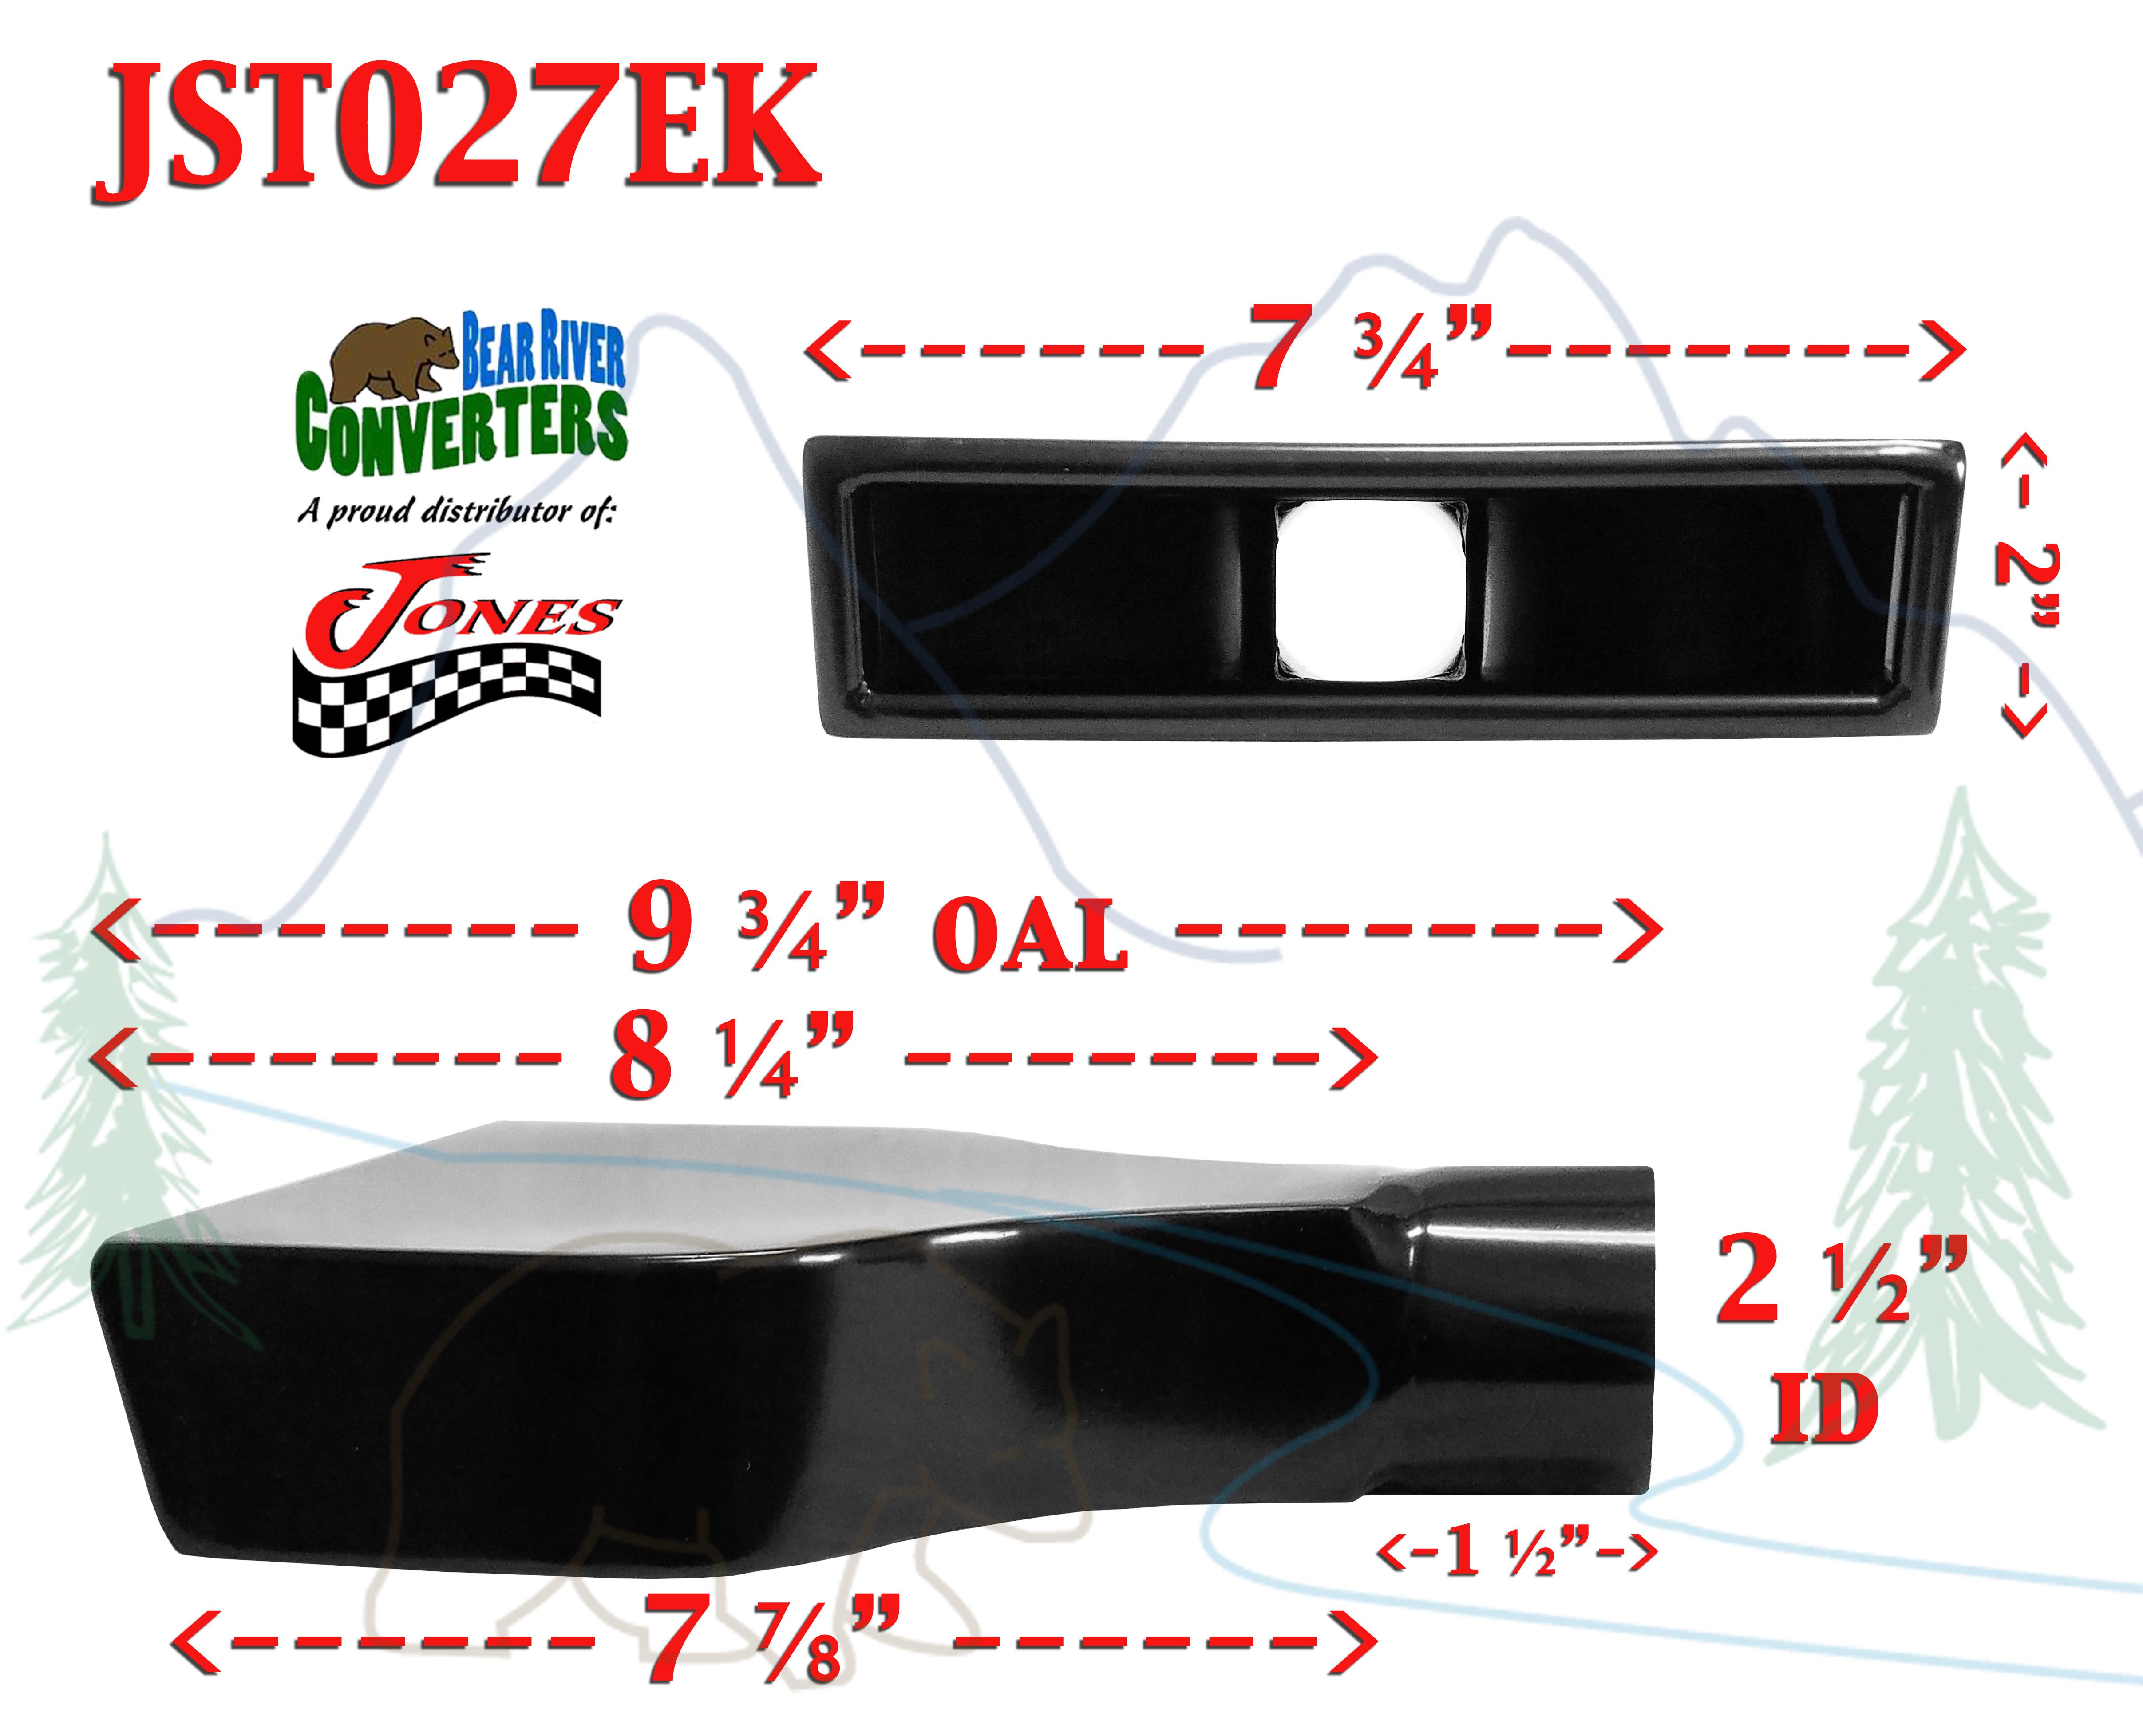 "JST027D2 2.5/"" Black Rectangle Camaro Exhaust Tip 2 1//2/"" Inlet 6/"" Wide 9/"" Long"